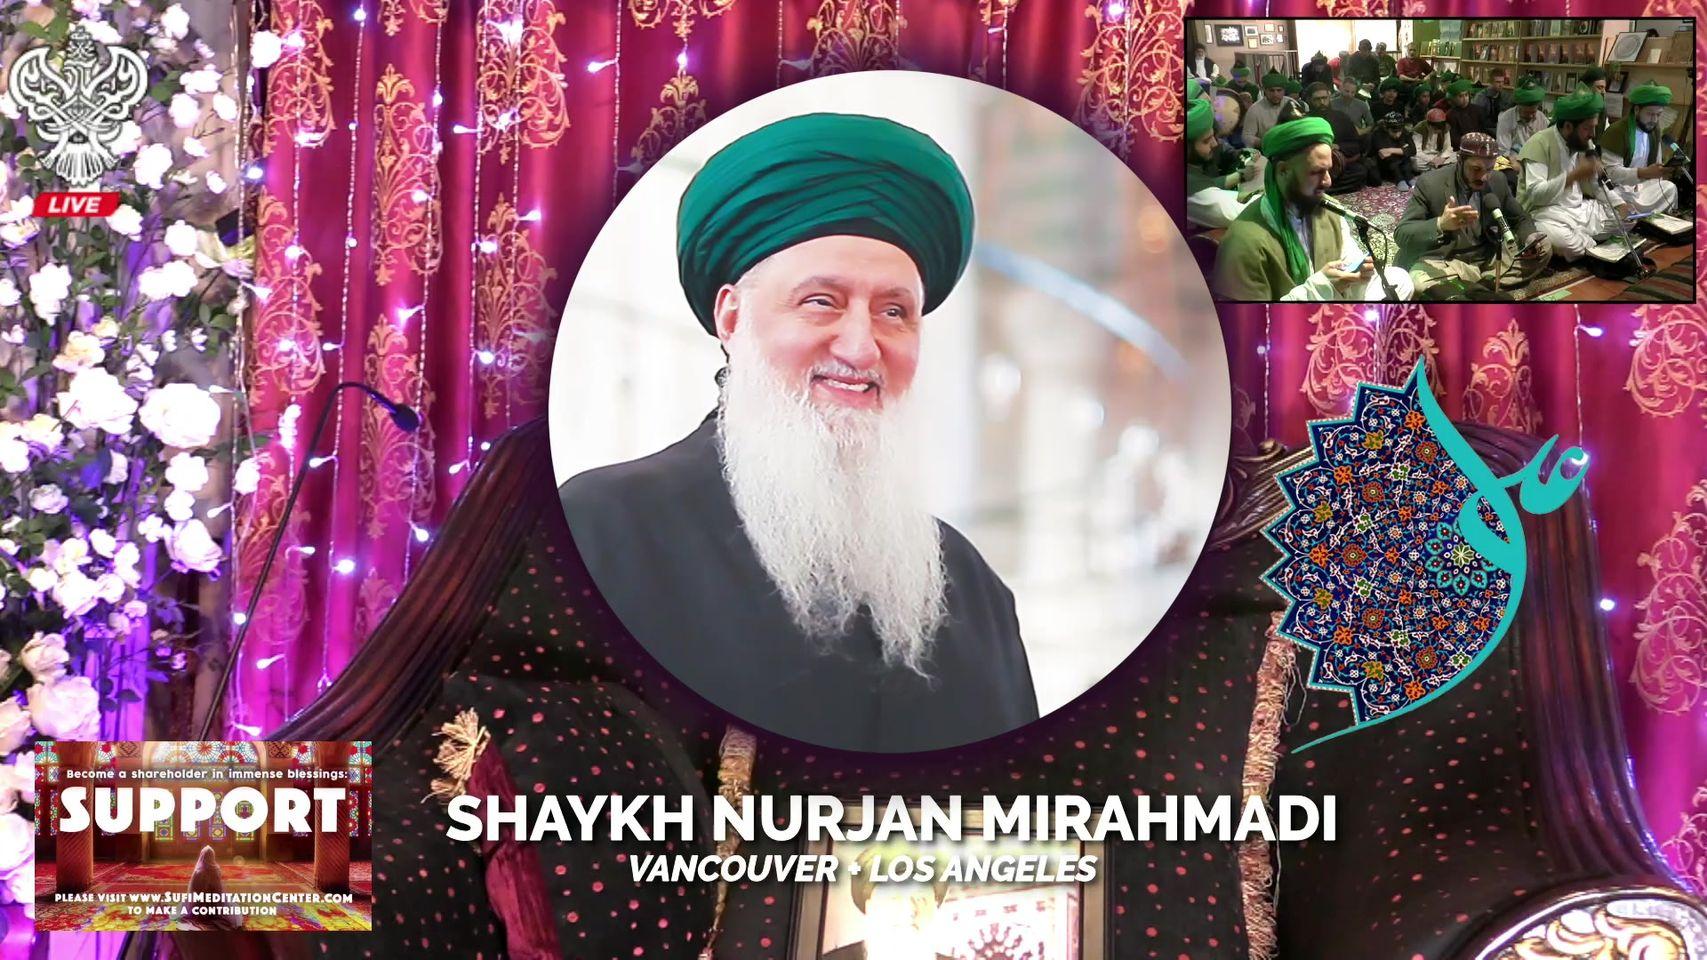 Live Zikr and Sohbat with Shaykh NurjanShaykh Nurjan is LIVE NOW join us for Z...